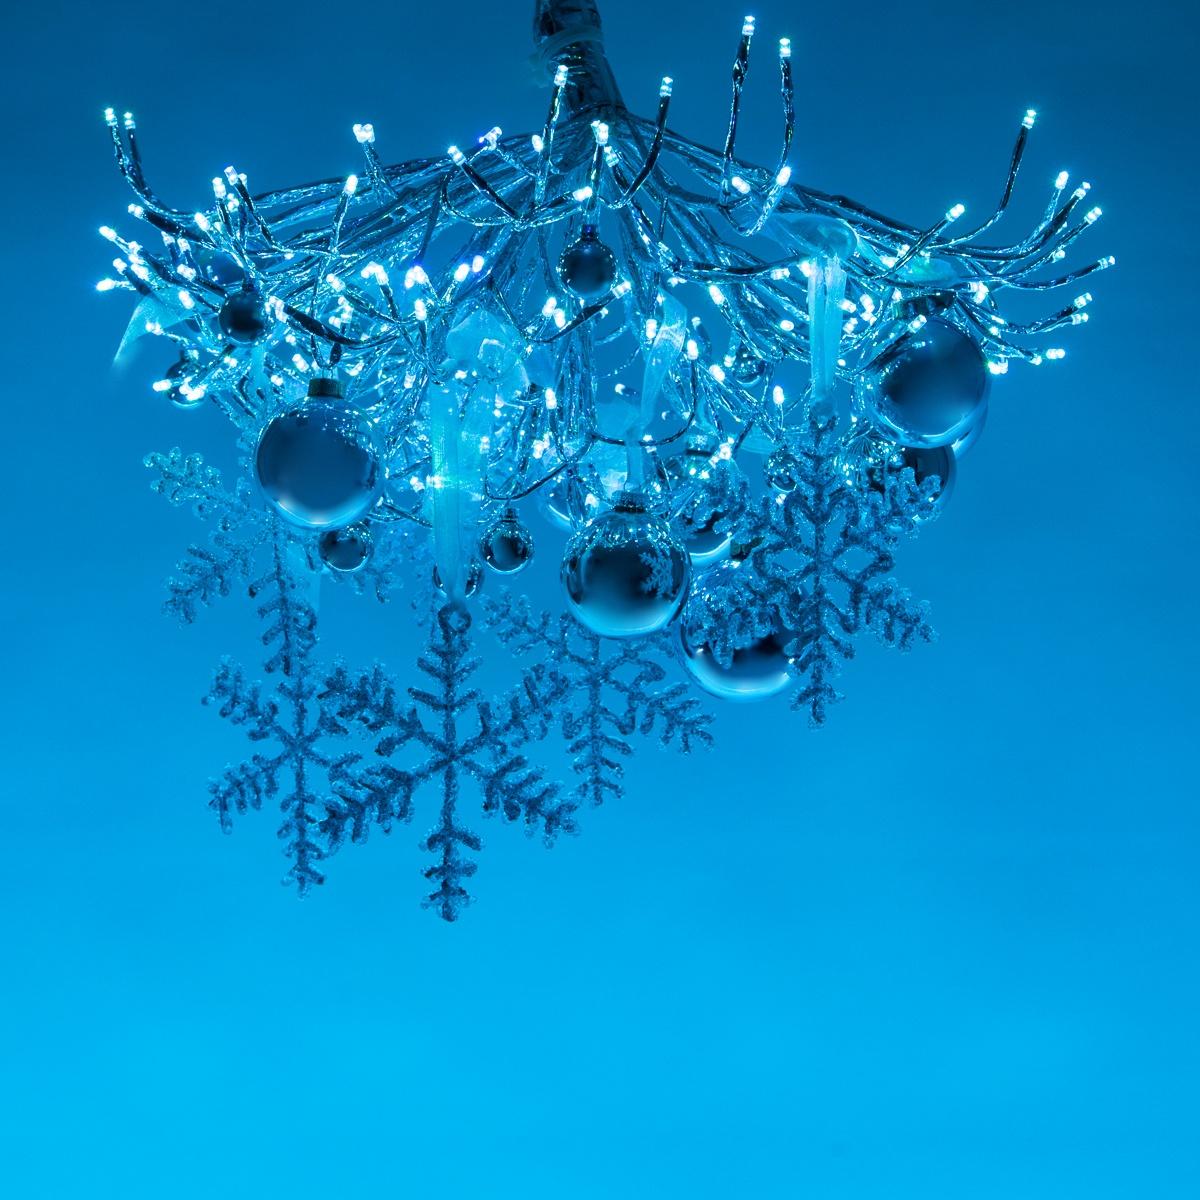 Winter Wonderland DIY Christmas Decoration - Lighted Branches Chandelier